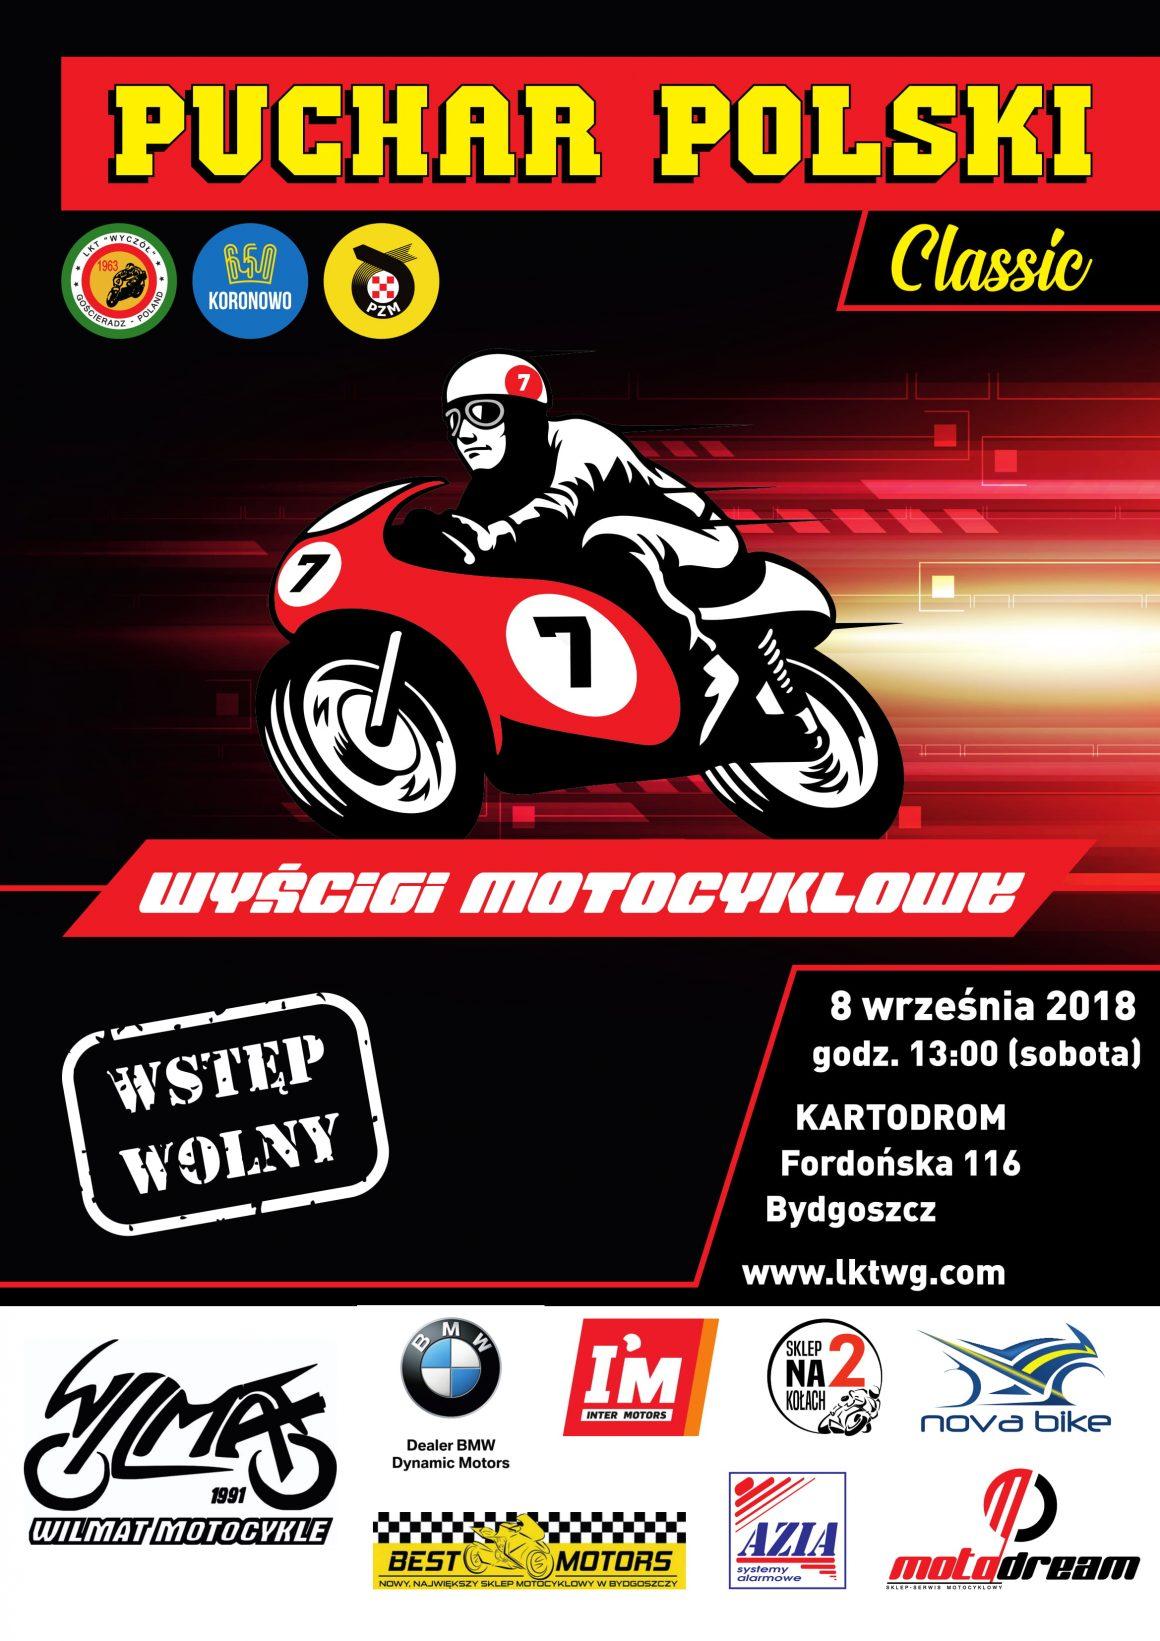 6. Runda Pucharu Polski klasy Classic, MPP 125 4T, Moto3, Superstock300